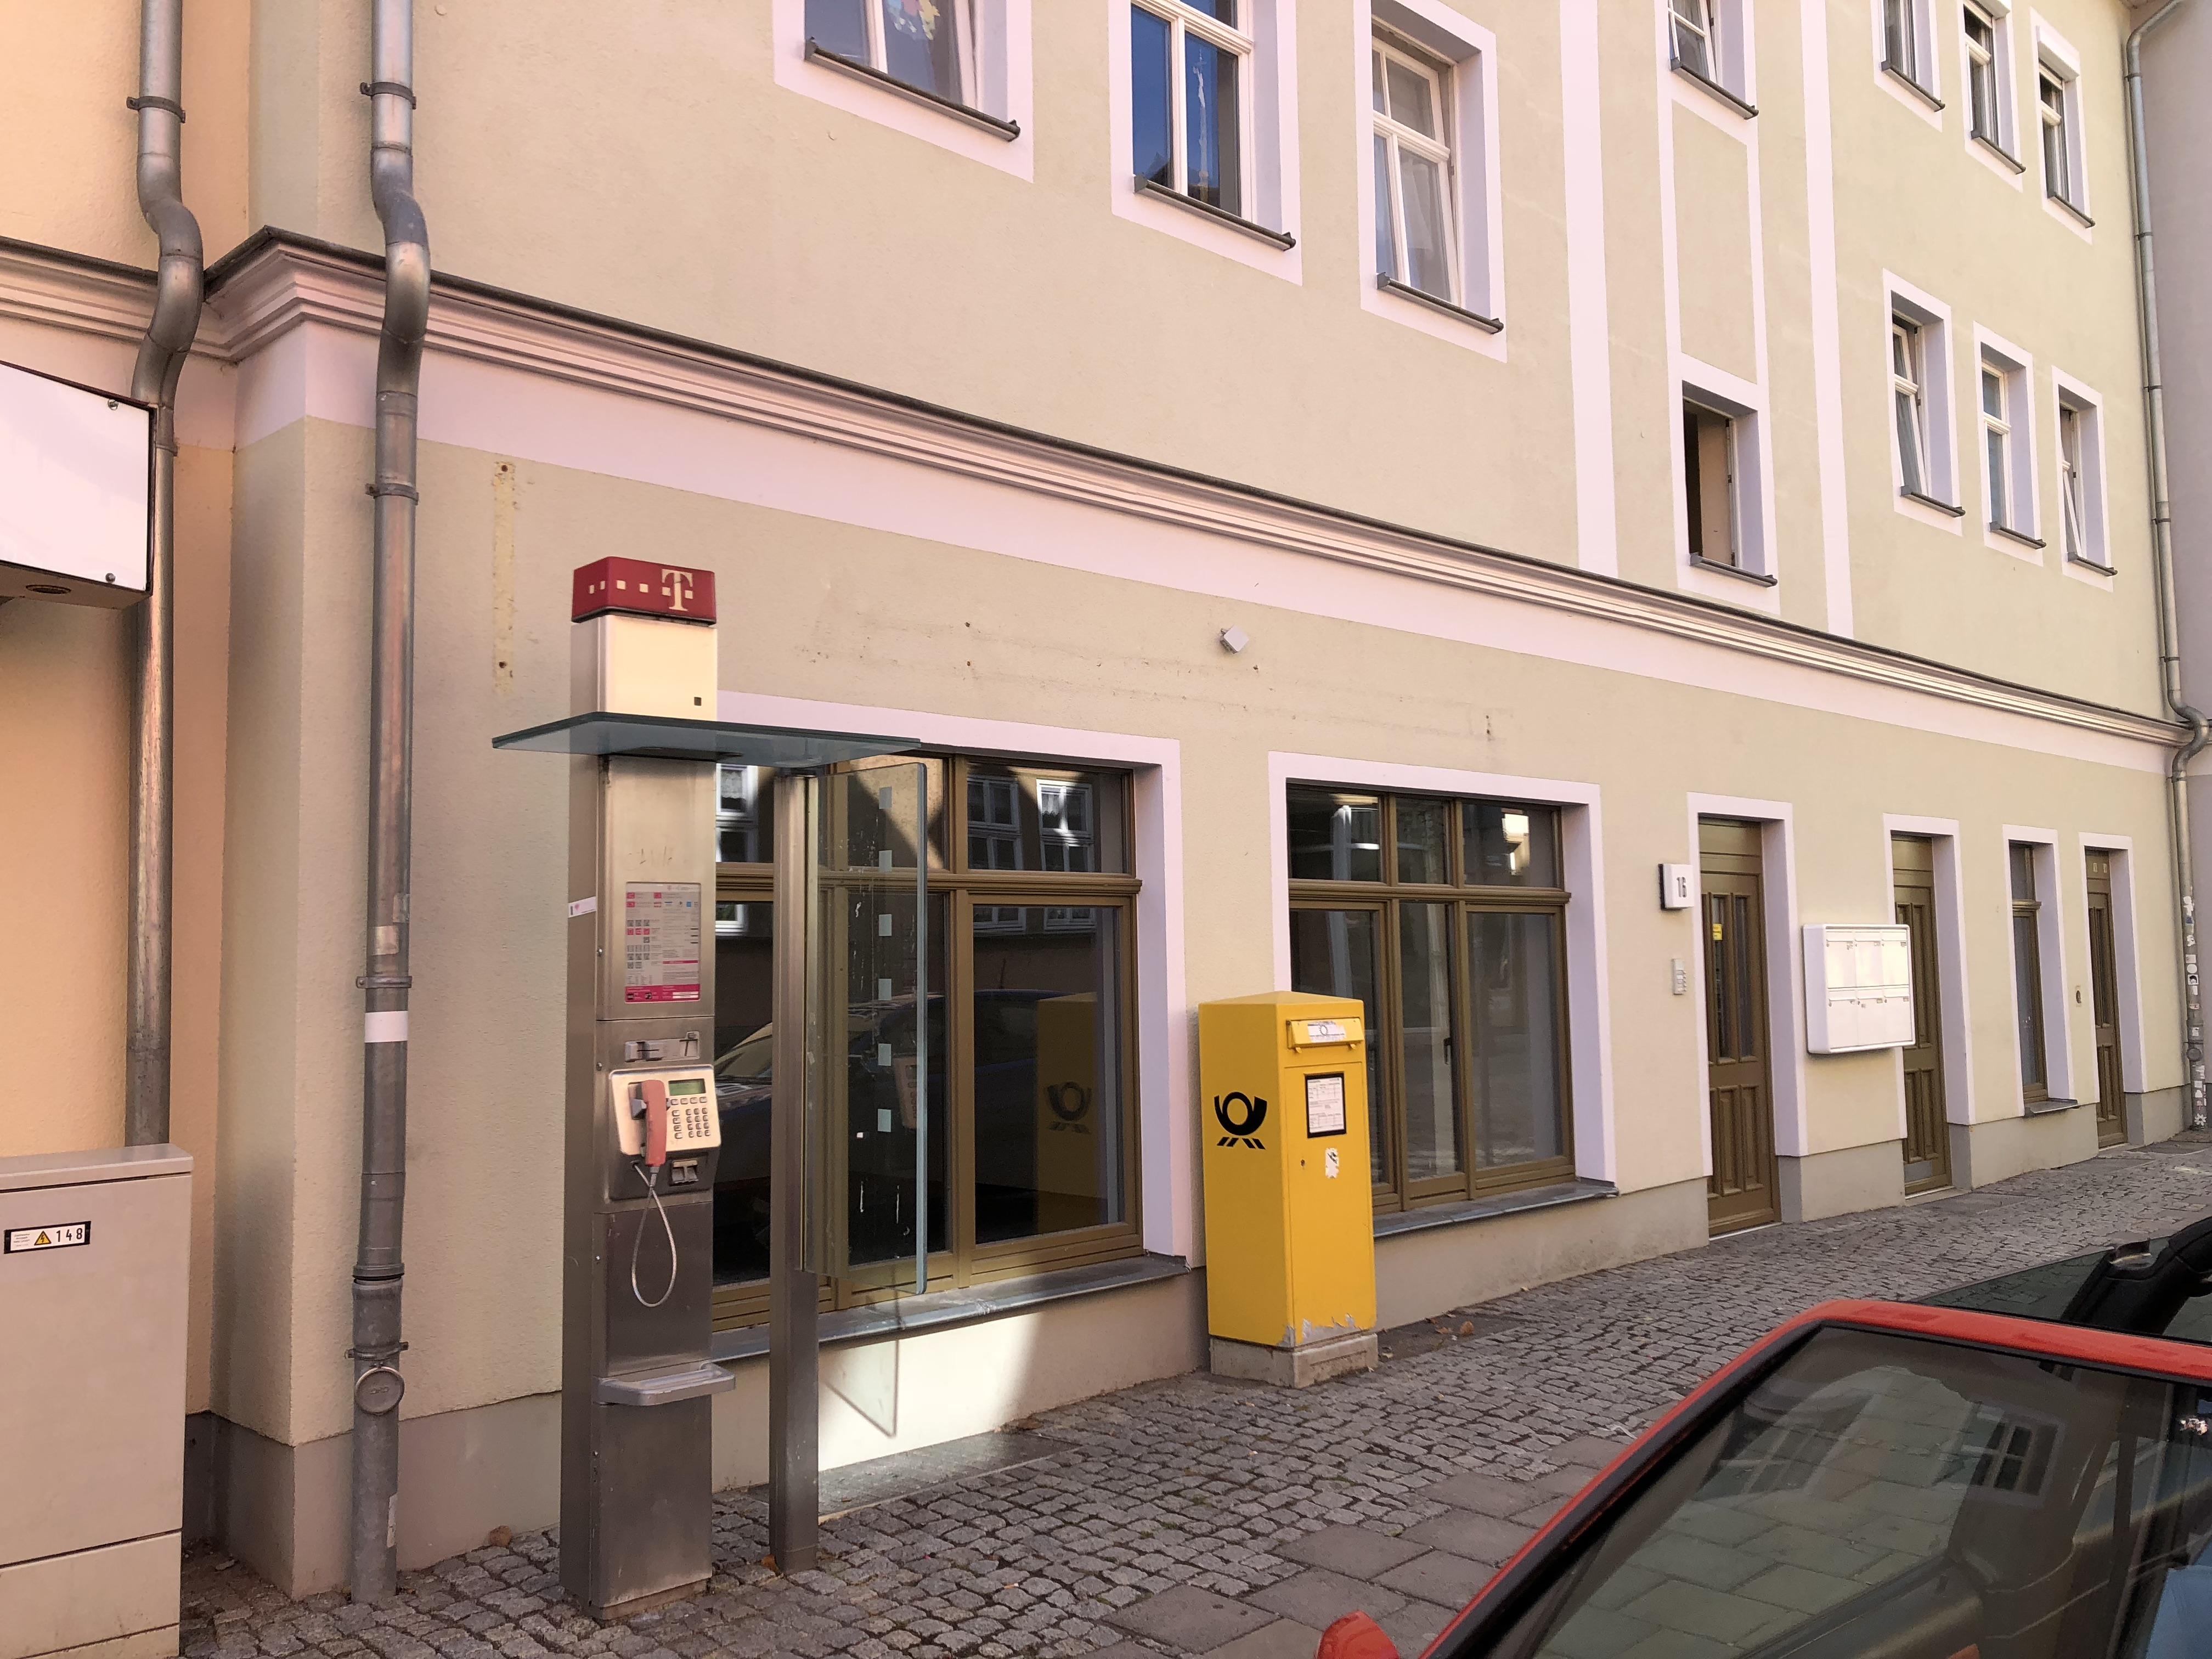 Ladenlokal ehemalige PostPostbank